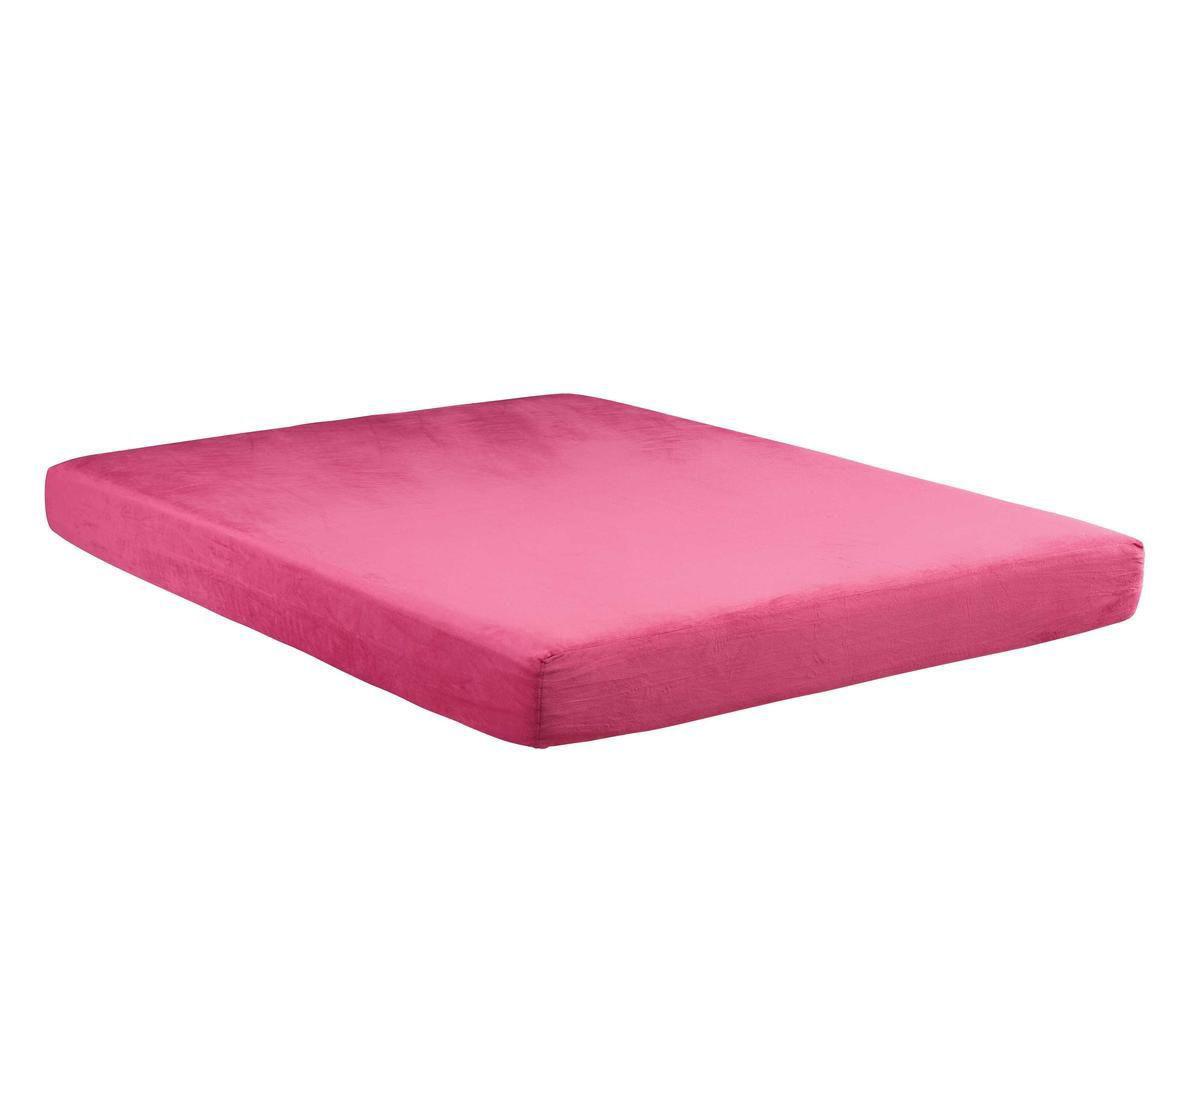 Pink Twin Mattress Foundation Badcock Home Furniture More